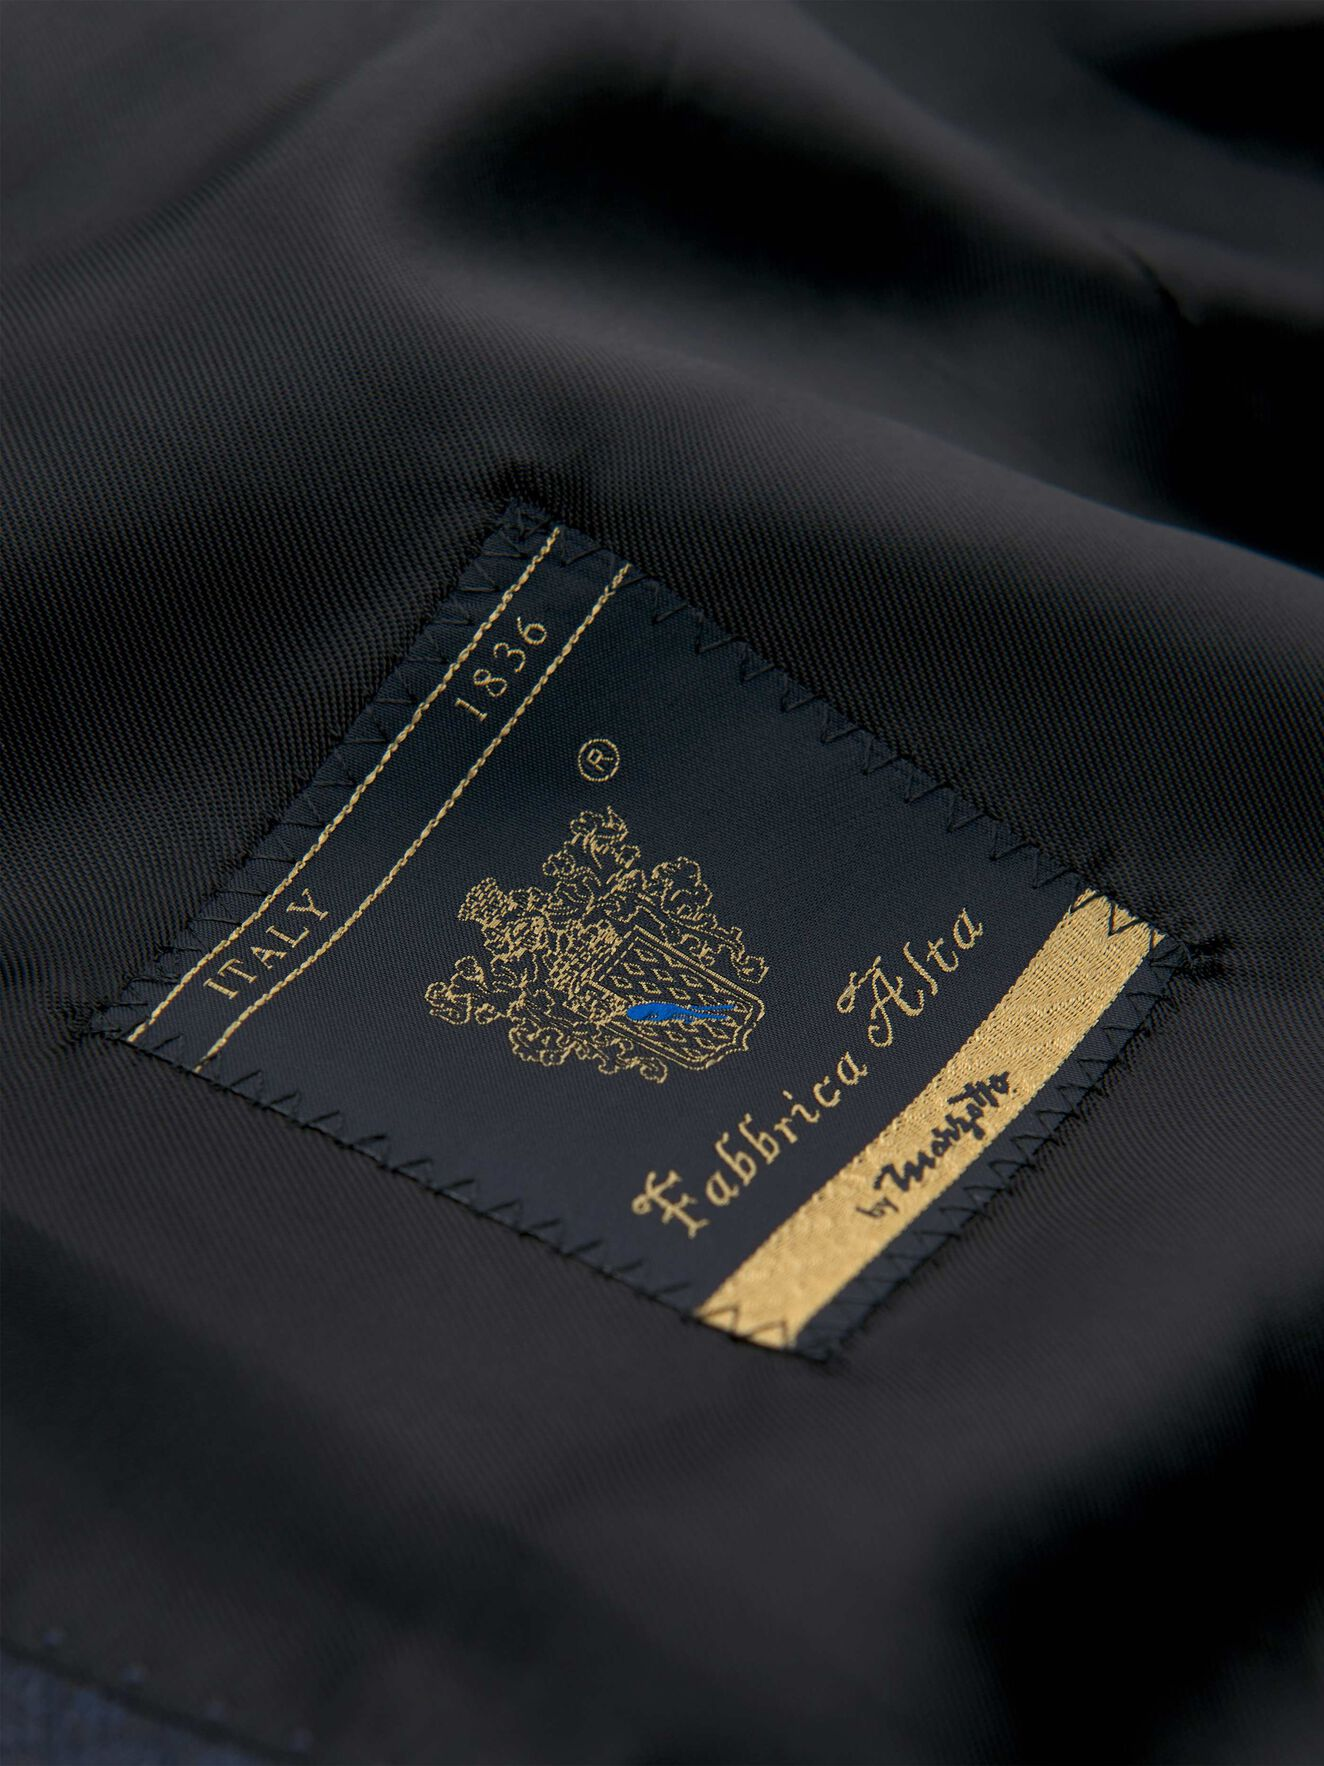 2018 Blazer in Royal Blue from Tiger of Sweden